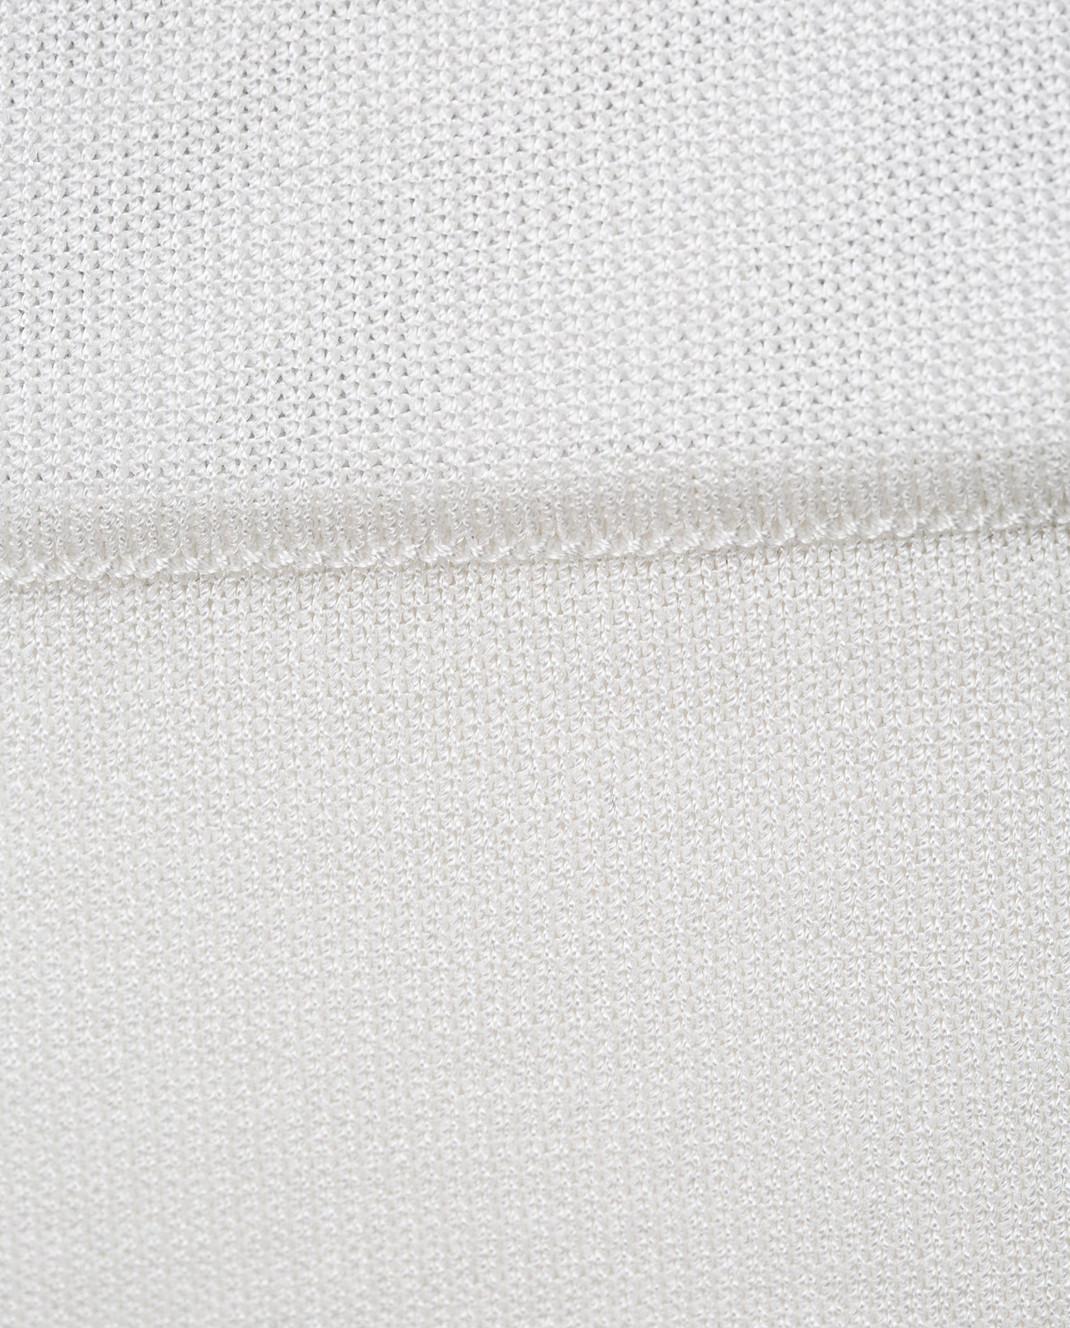 Tsarevna Белые шорты TS0102 изображение 5